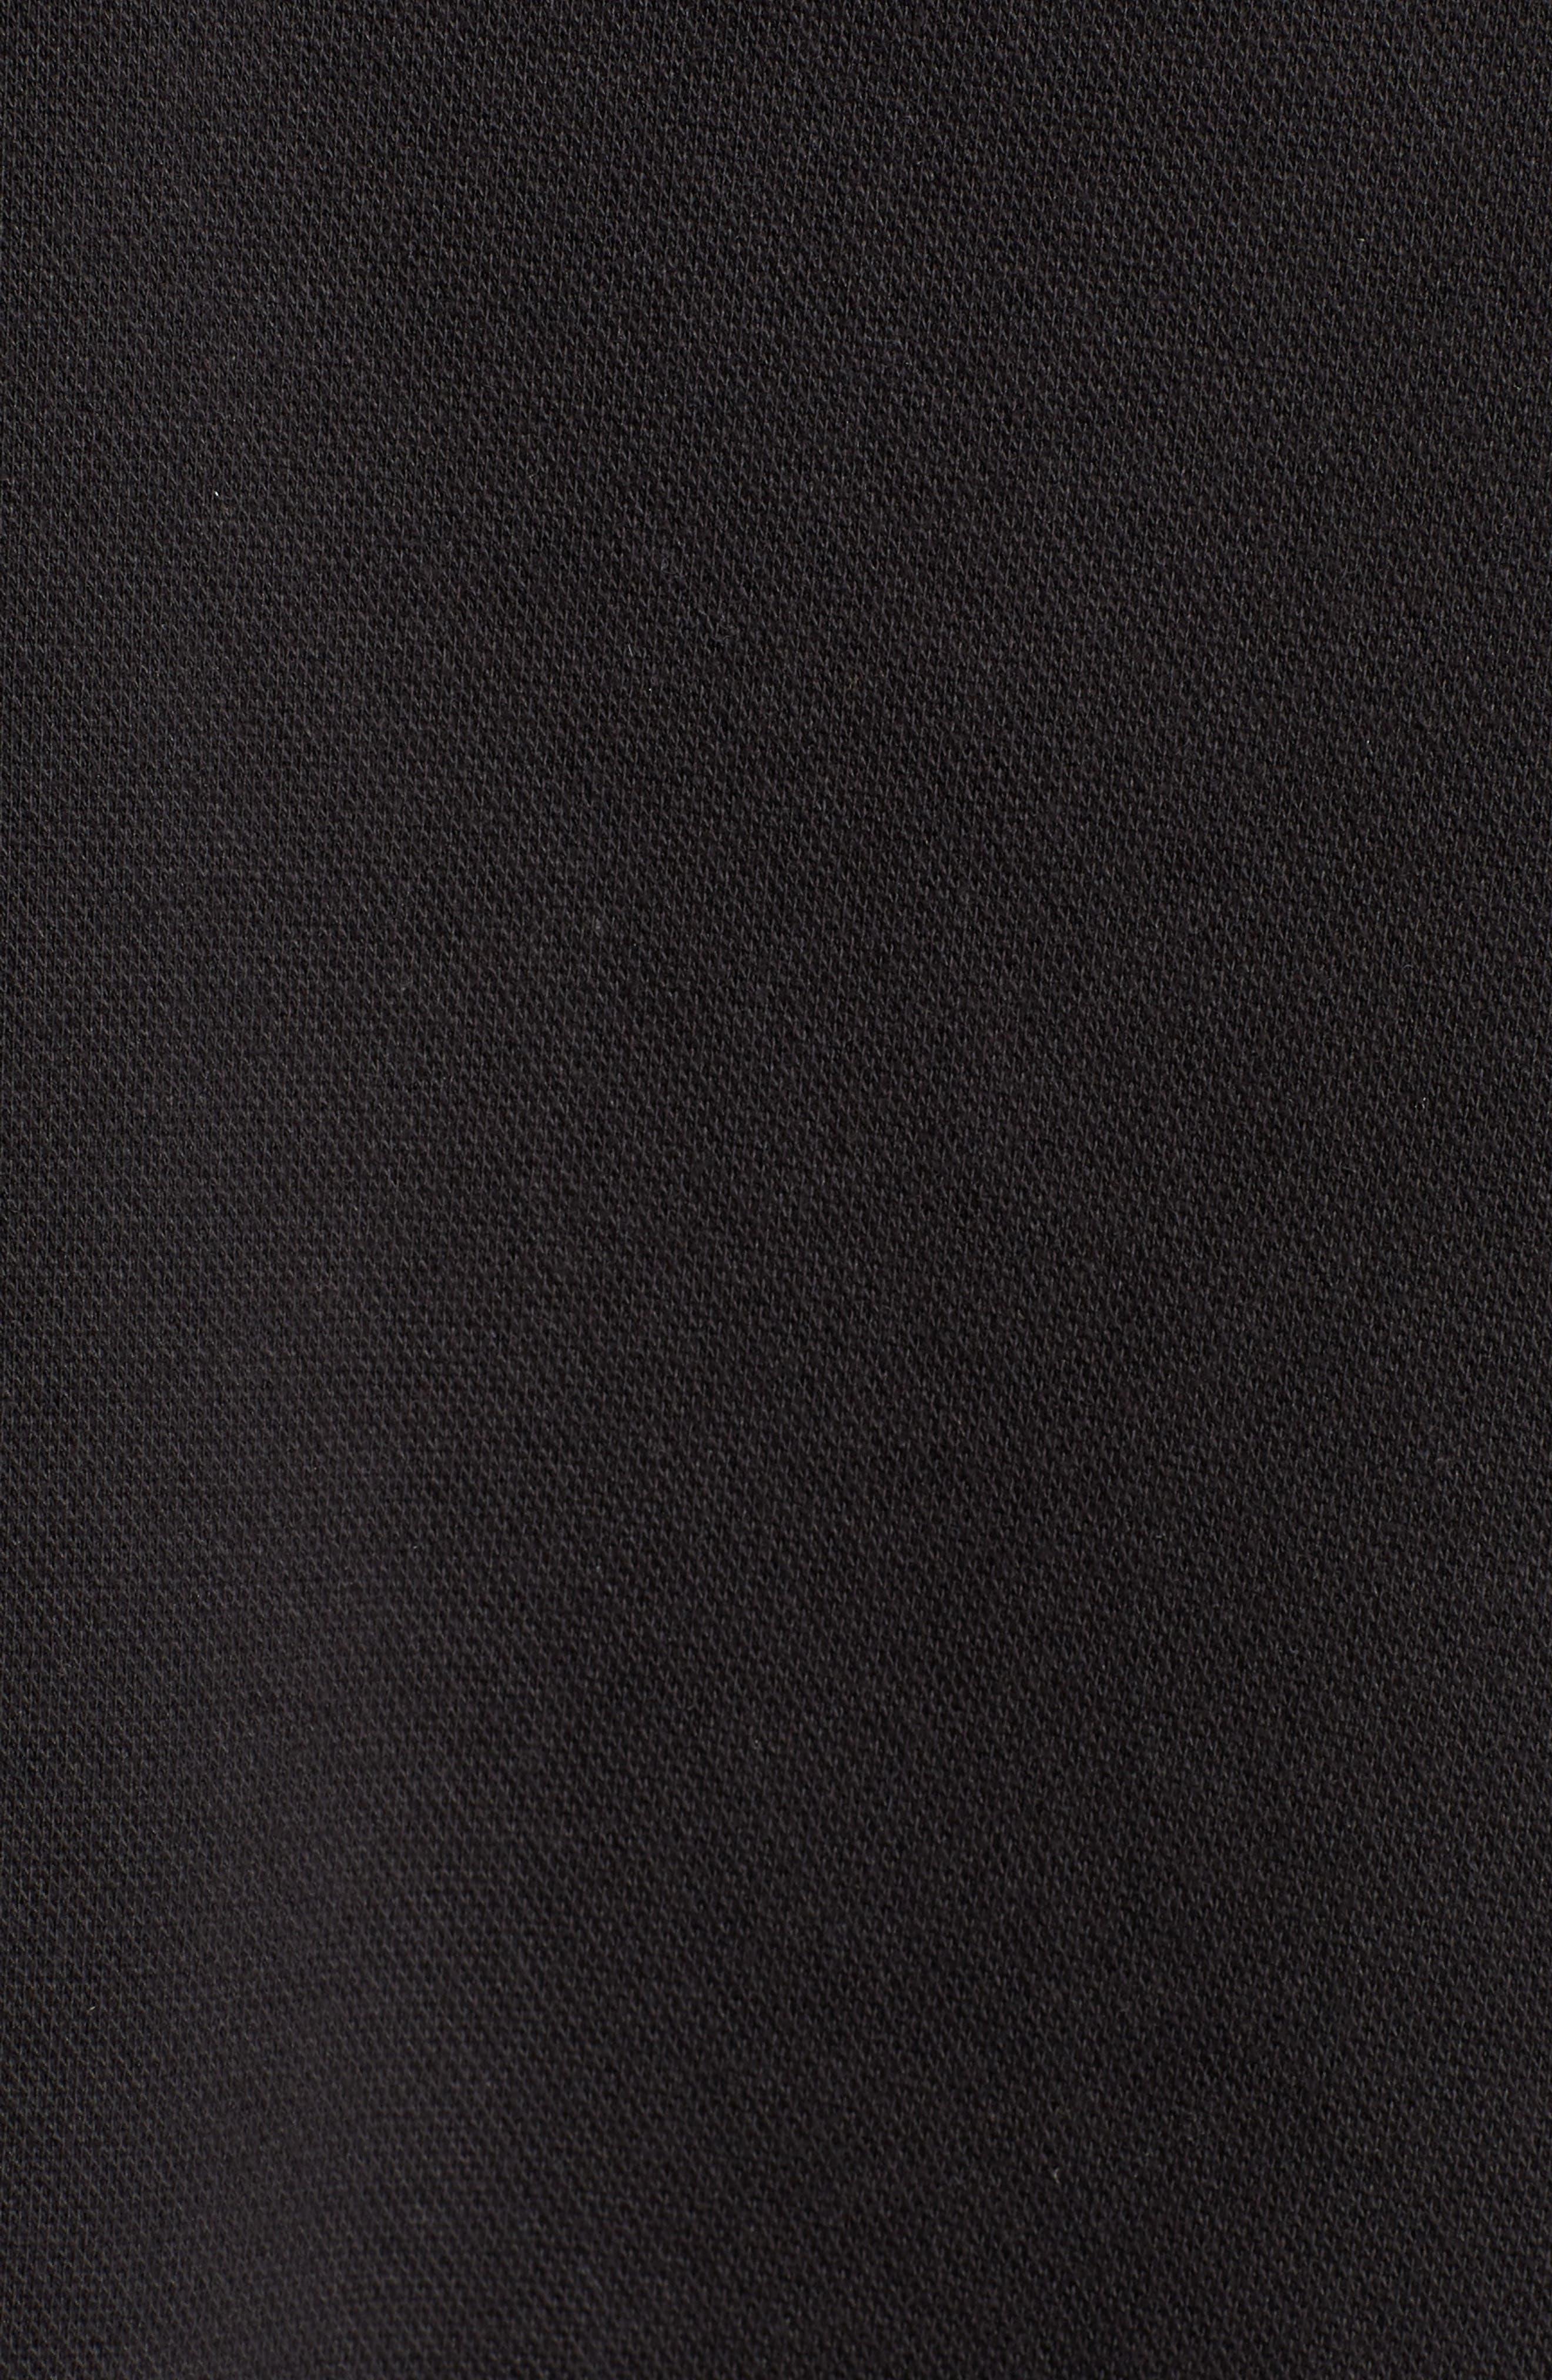 NYC Sweatshirt,                             Alternate thumbnail 6, color,                             BLACK